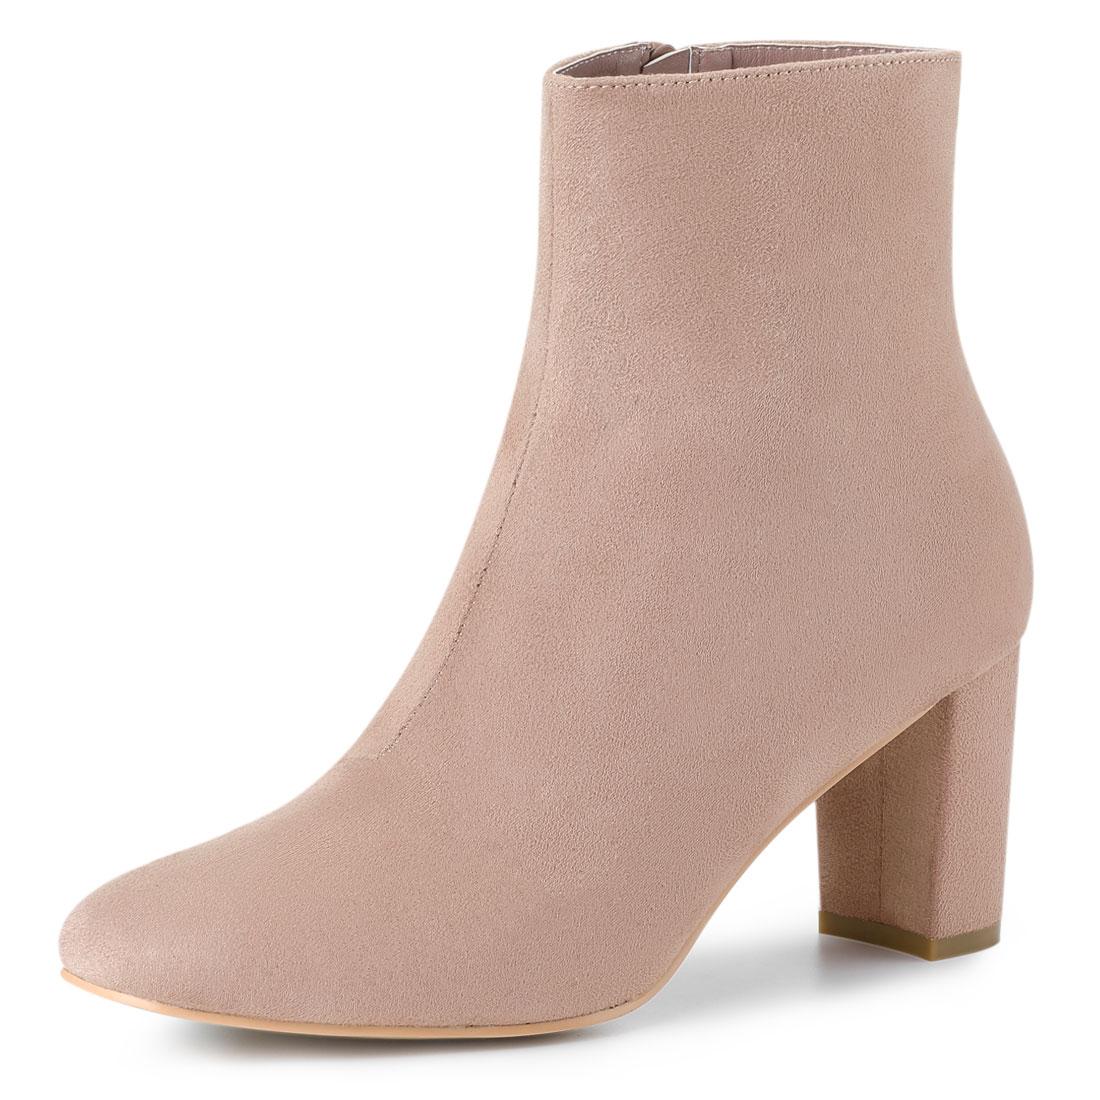 Allegra K Women's Dress Side Zip Chunky Heel Ankle Boots Pink US 9